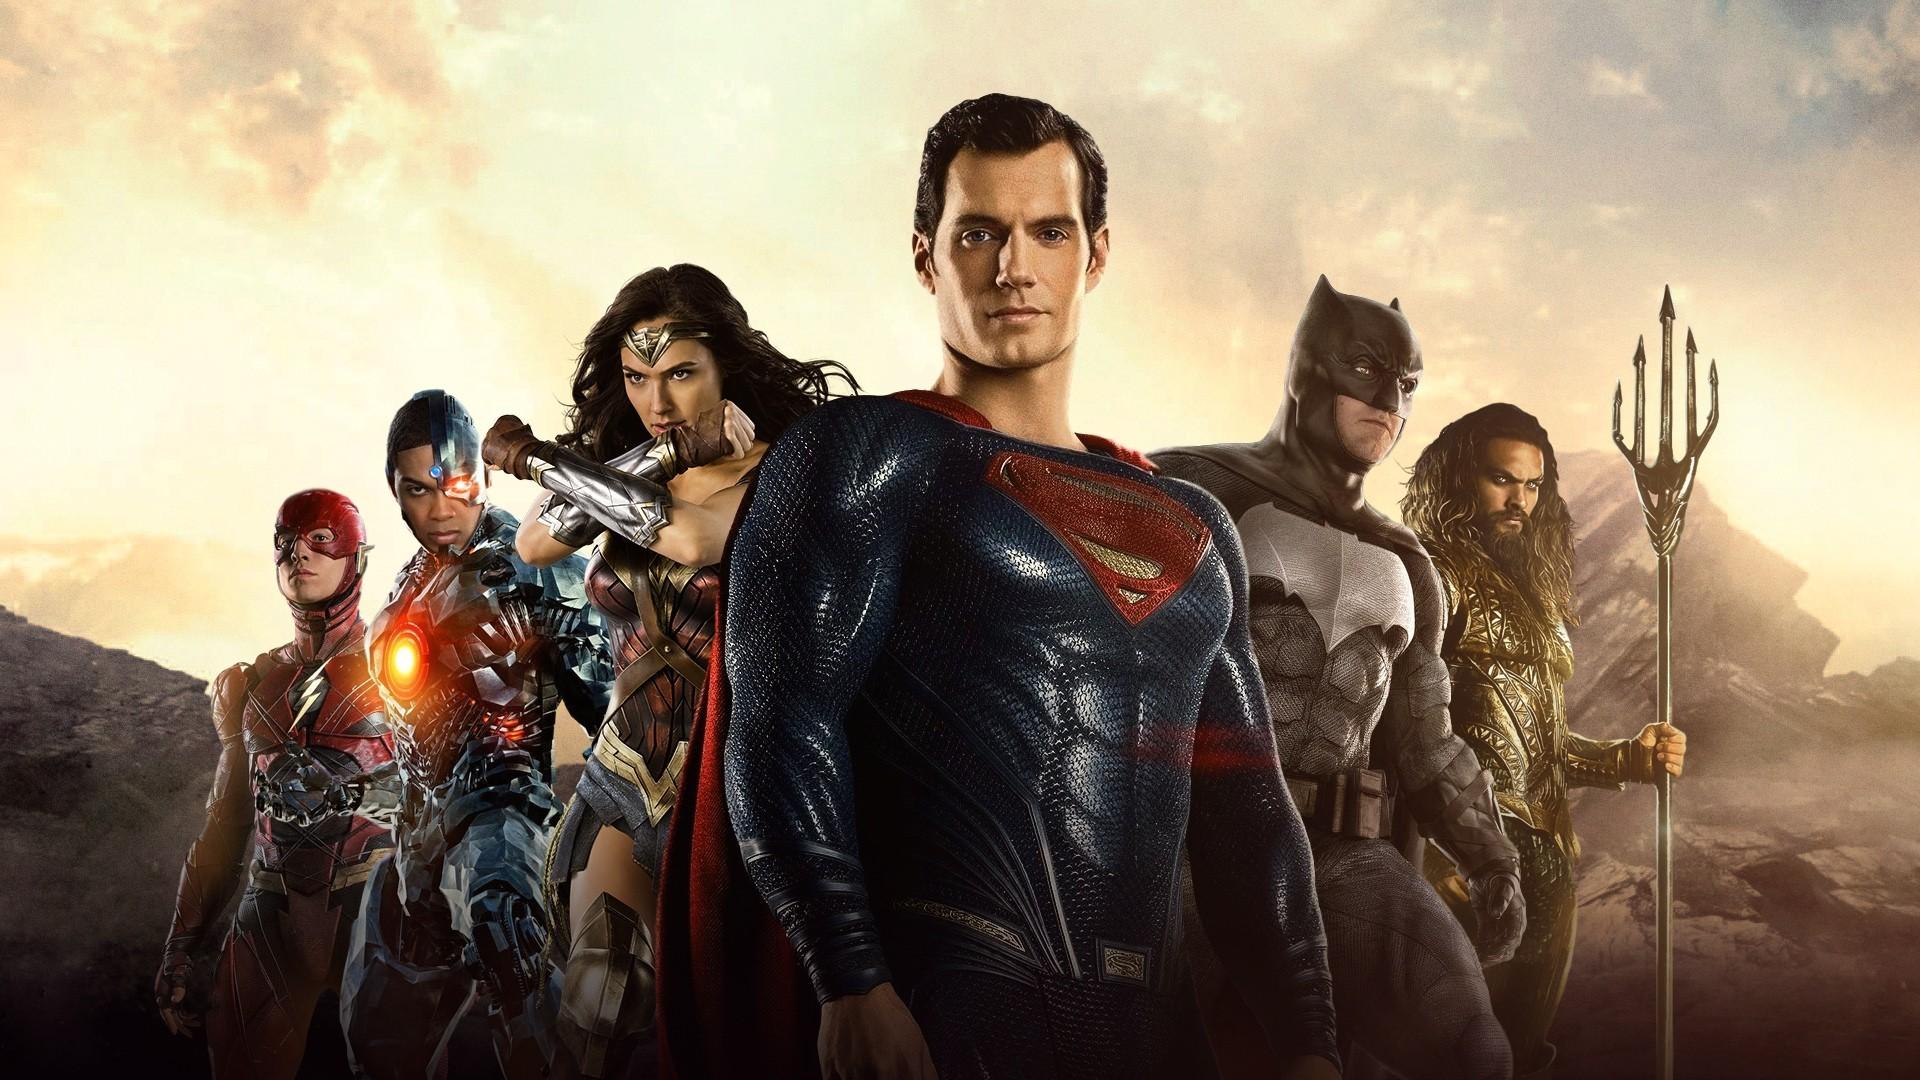 Justice League Poster computer wallpaper